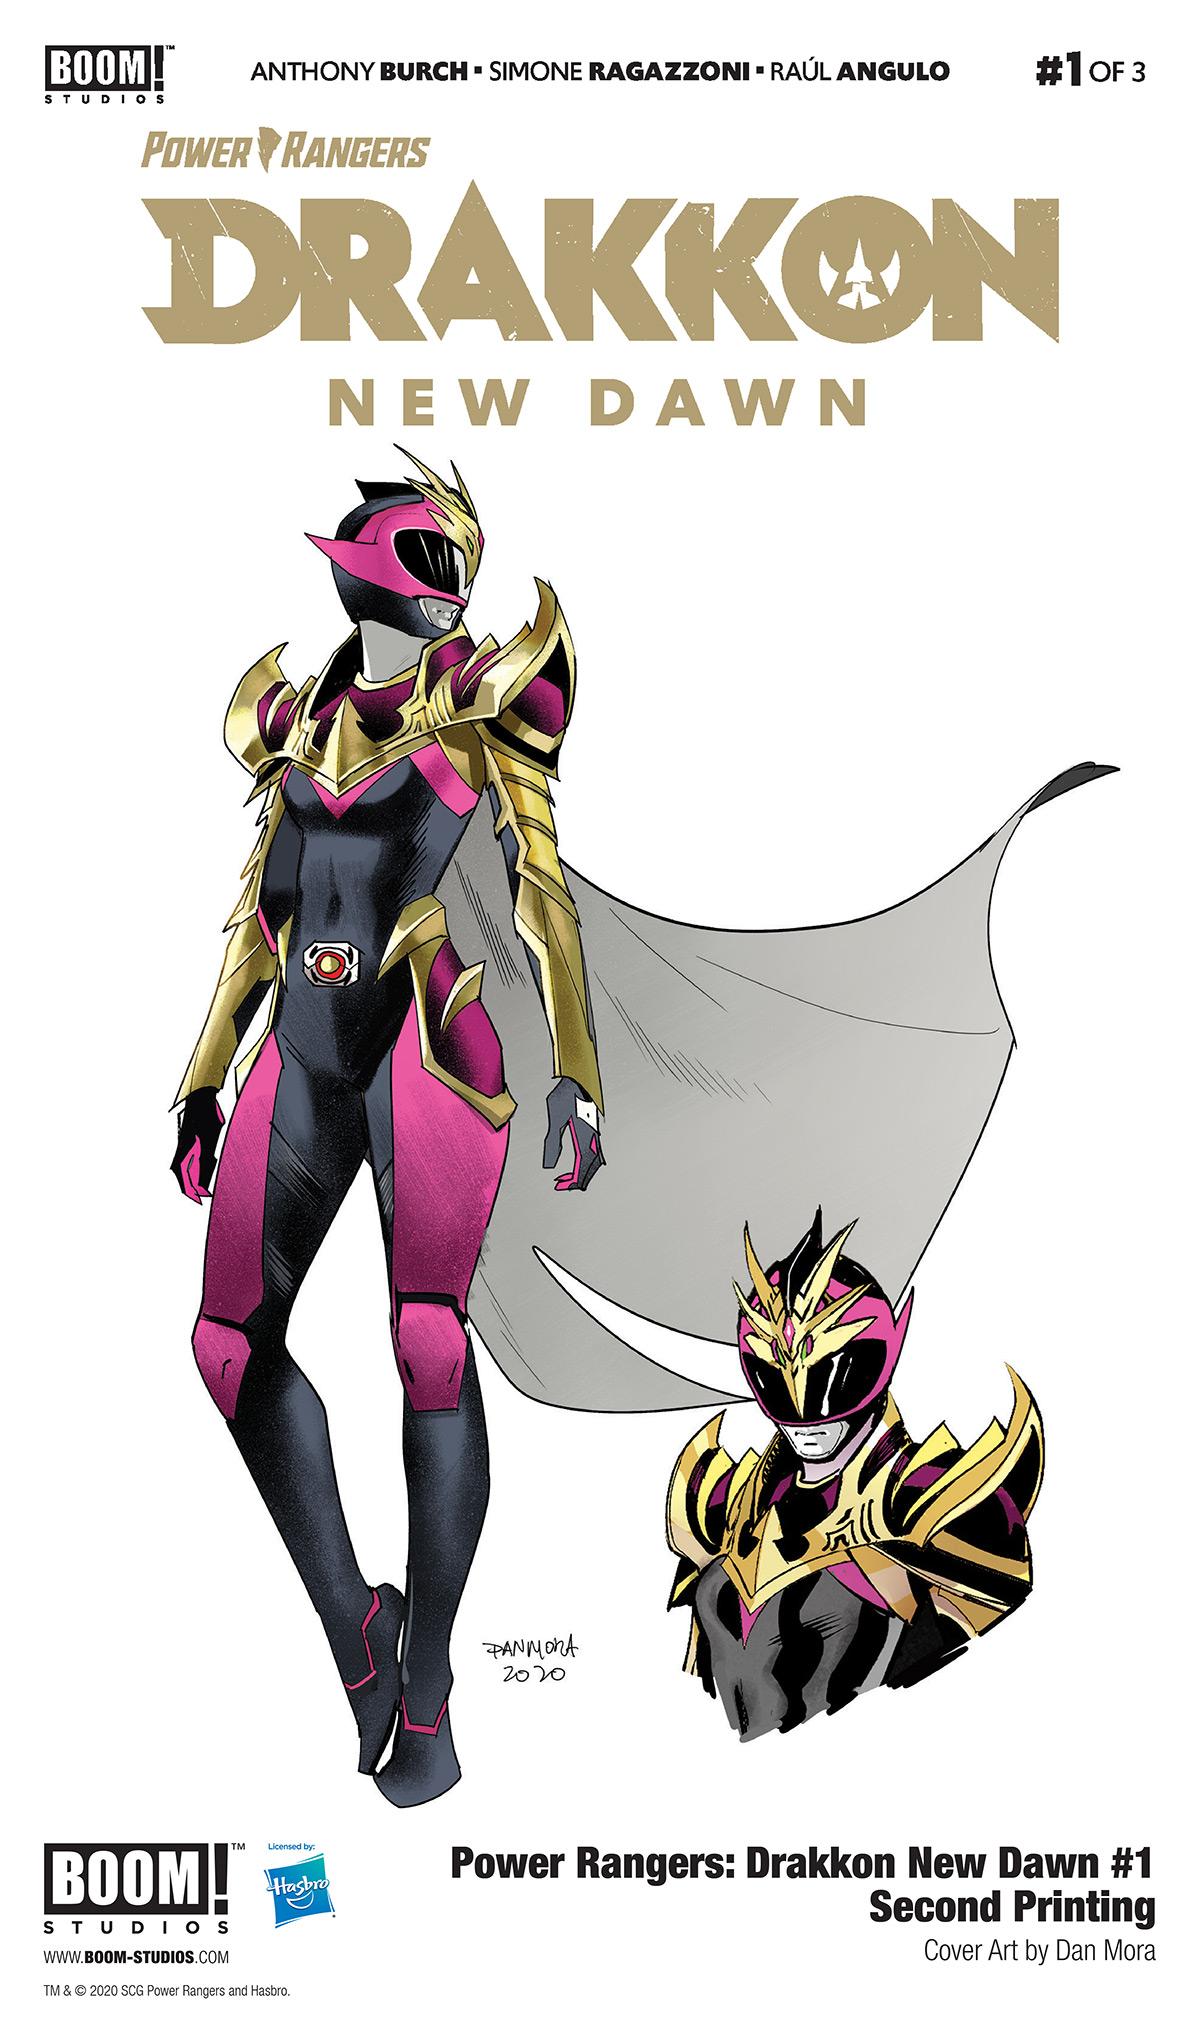 Power Rangers: Drakkon New Dawn #1 to Return with New Printing - Previews  World